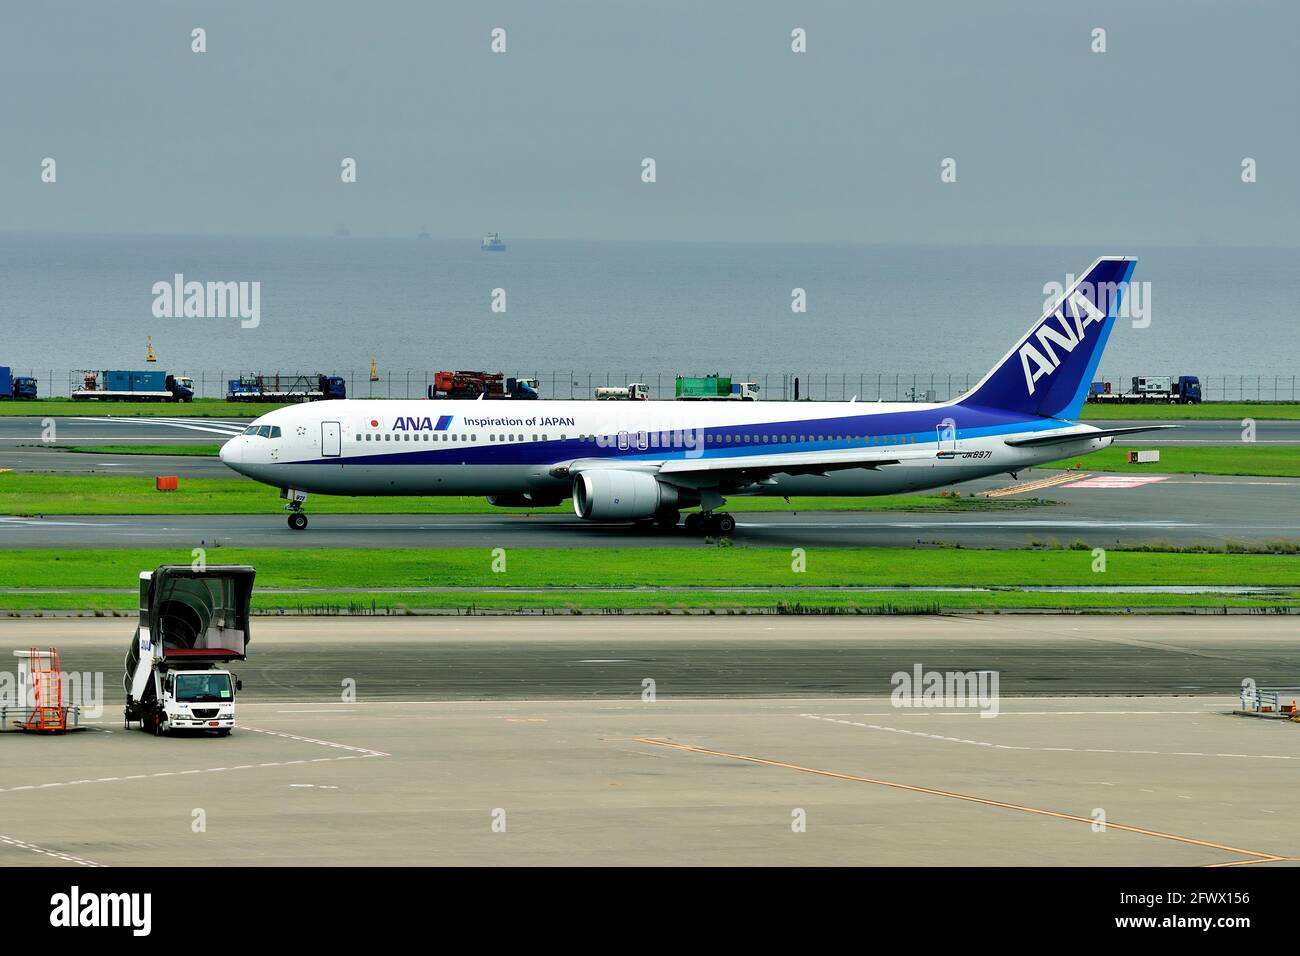 All Nippon Airways, ANA, Boeing, B-767/300, JA8971, Take Off, Naha Airport, Okinawa, Japan Stock Photo